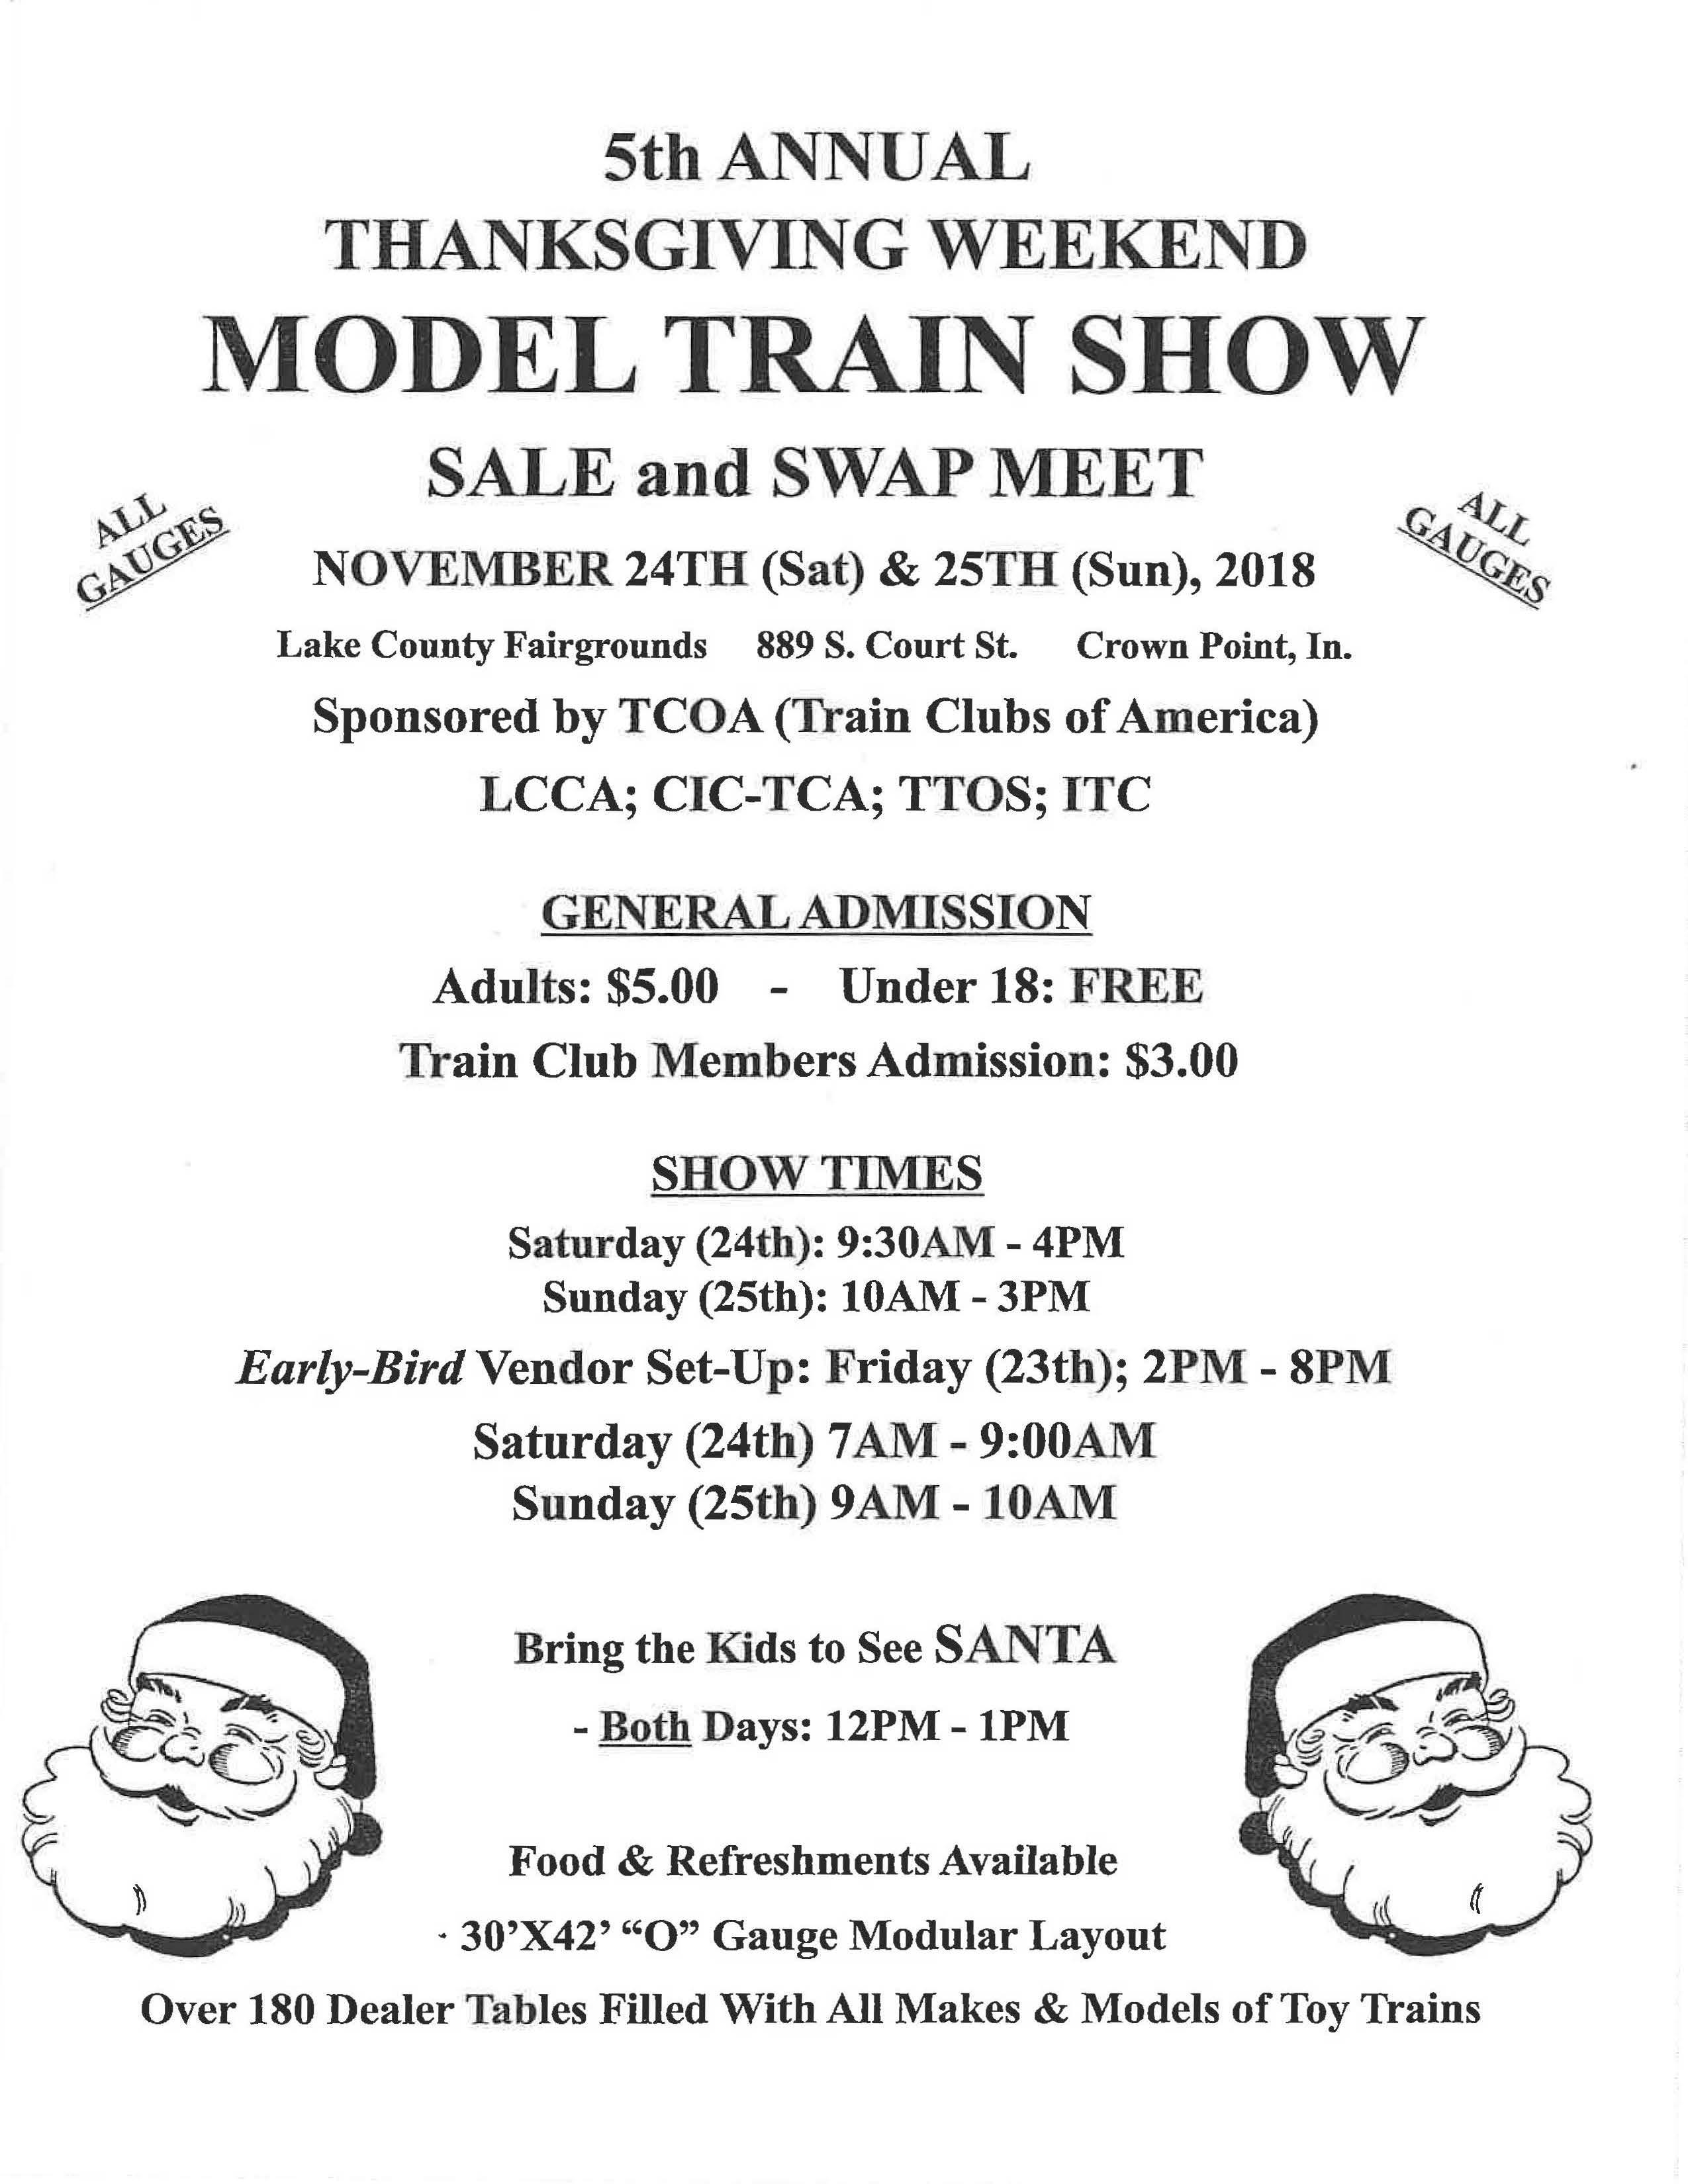 Model Train Show Flyer